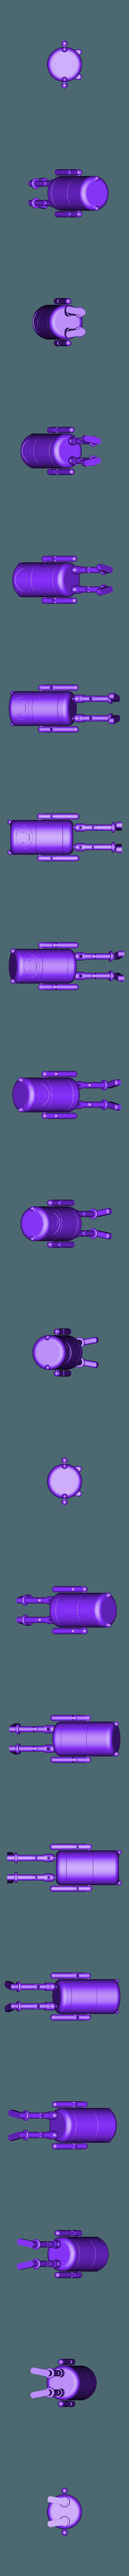 Finn_the_Human_v1.stl Download free STL file Finn - Articulated Toy • 3D print template, Piggie